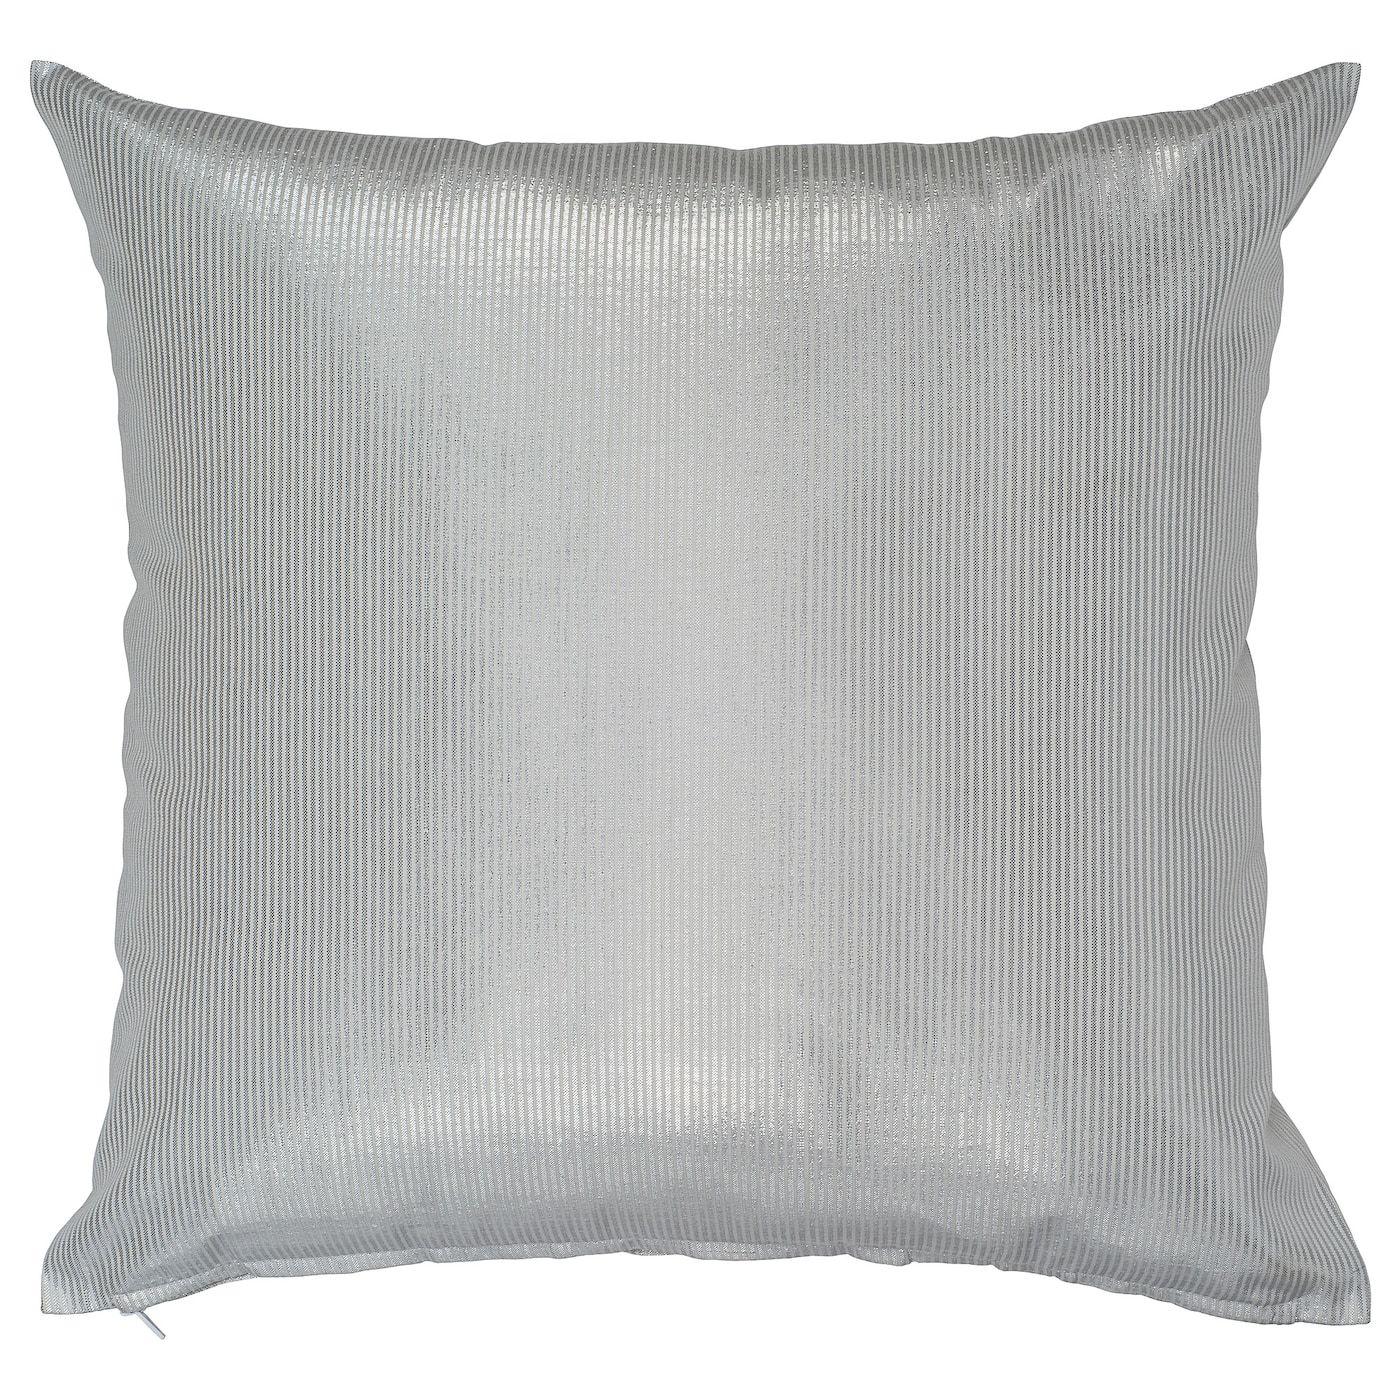 Bengerd Kissenbezug Silberfarben Kissenbezuge Kissen Und Ikea